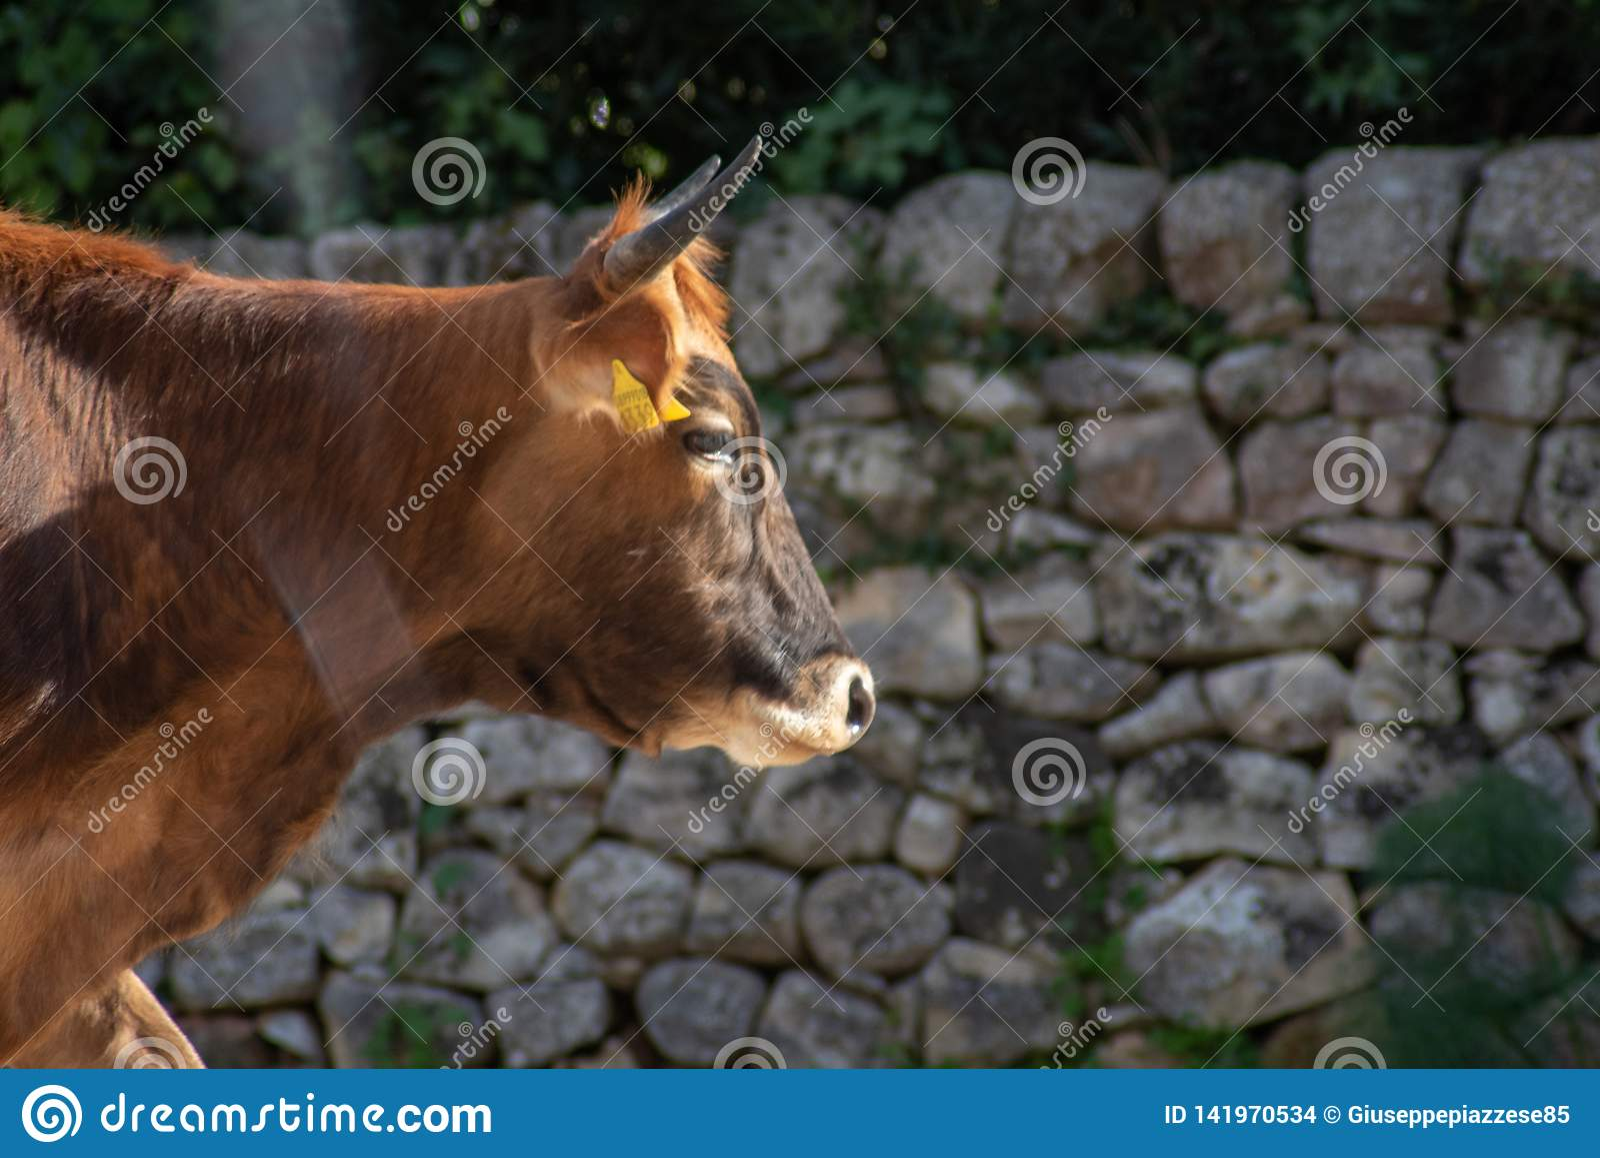 Uma vaca ao pastar